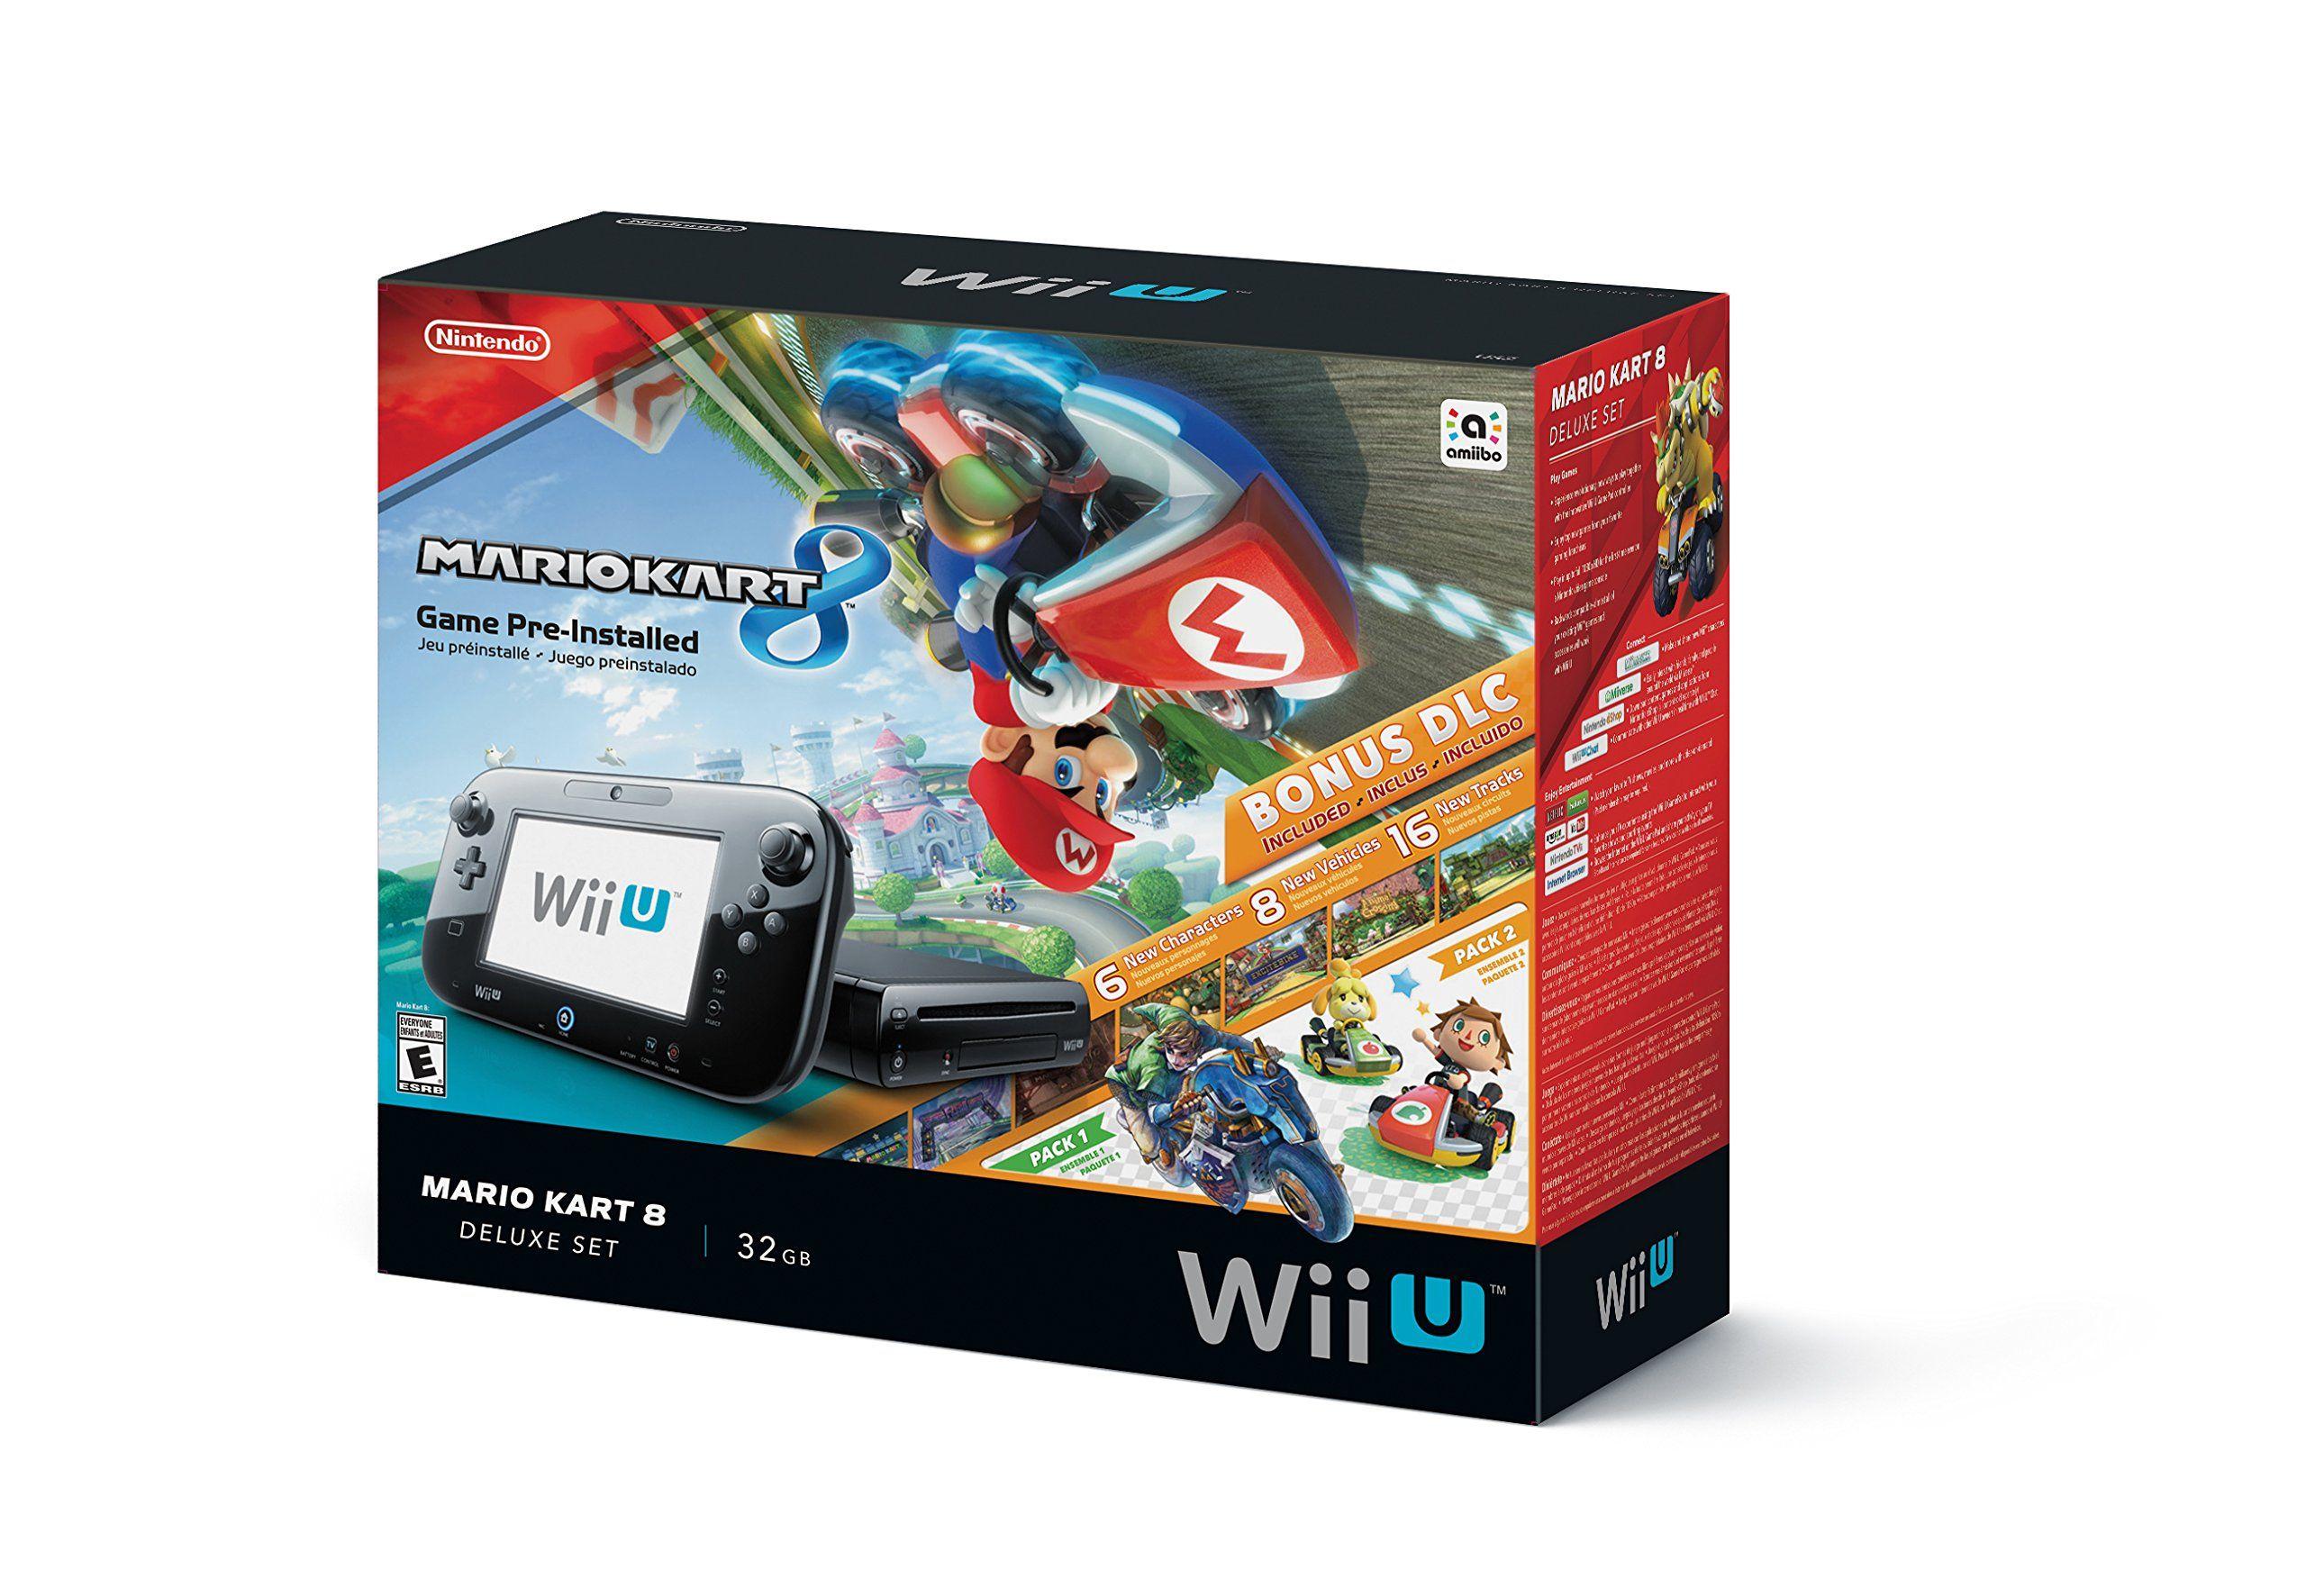 Nintendo Wii U 32gb Mario Kart 8 Pre Installed Wii U Is The Revolutionary Console From Nintendo Featuring High Mario Kart 8 Mario Kart Nintendo Mario Kart